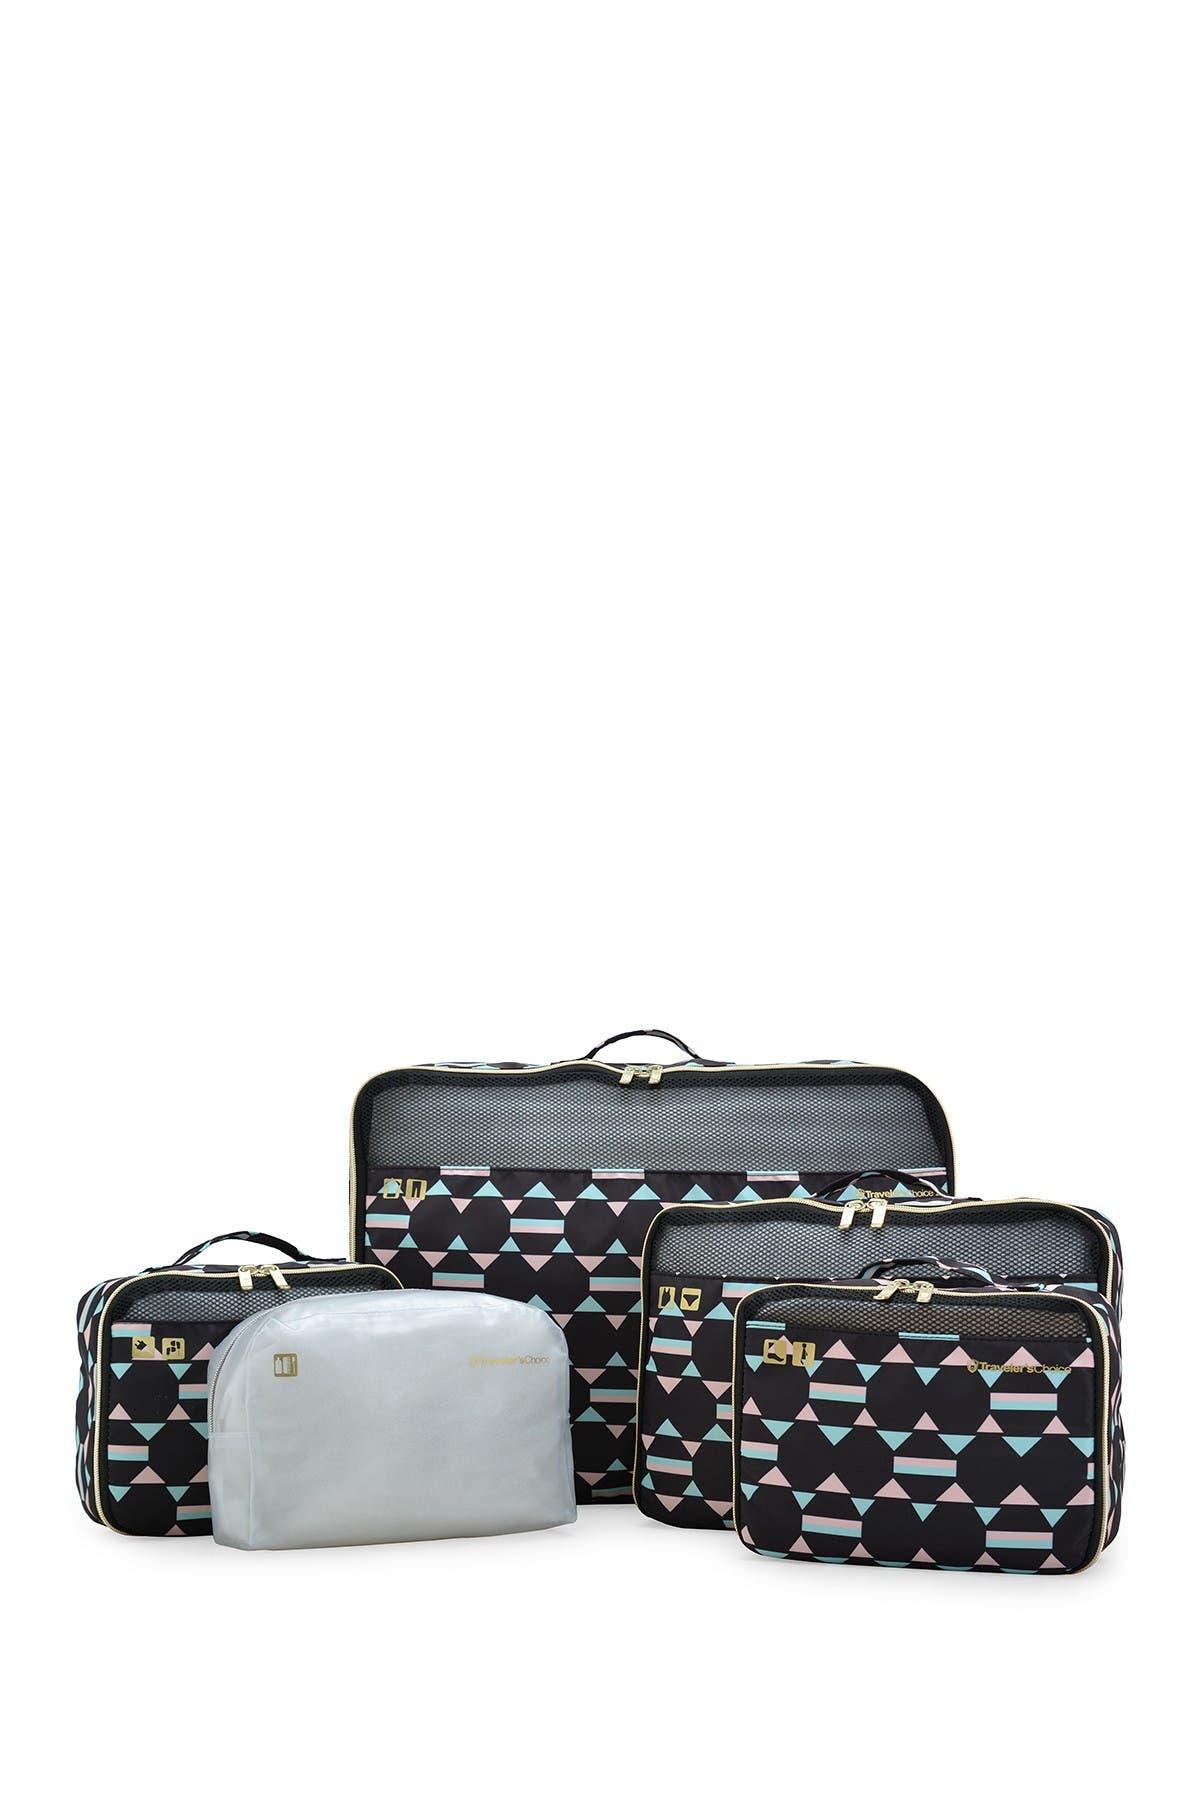 Image of Traveler's Choice Packing Cubes 5-Piece Set